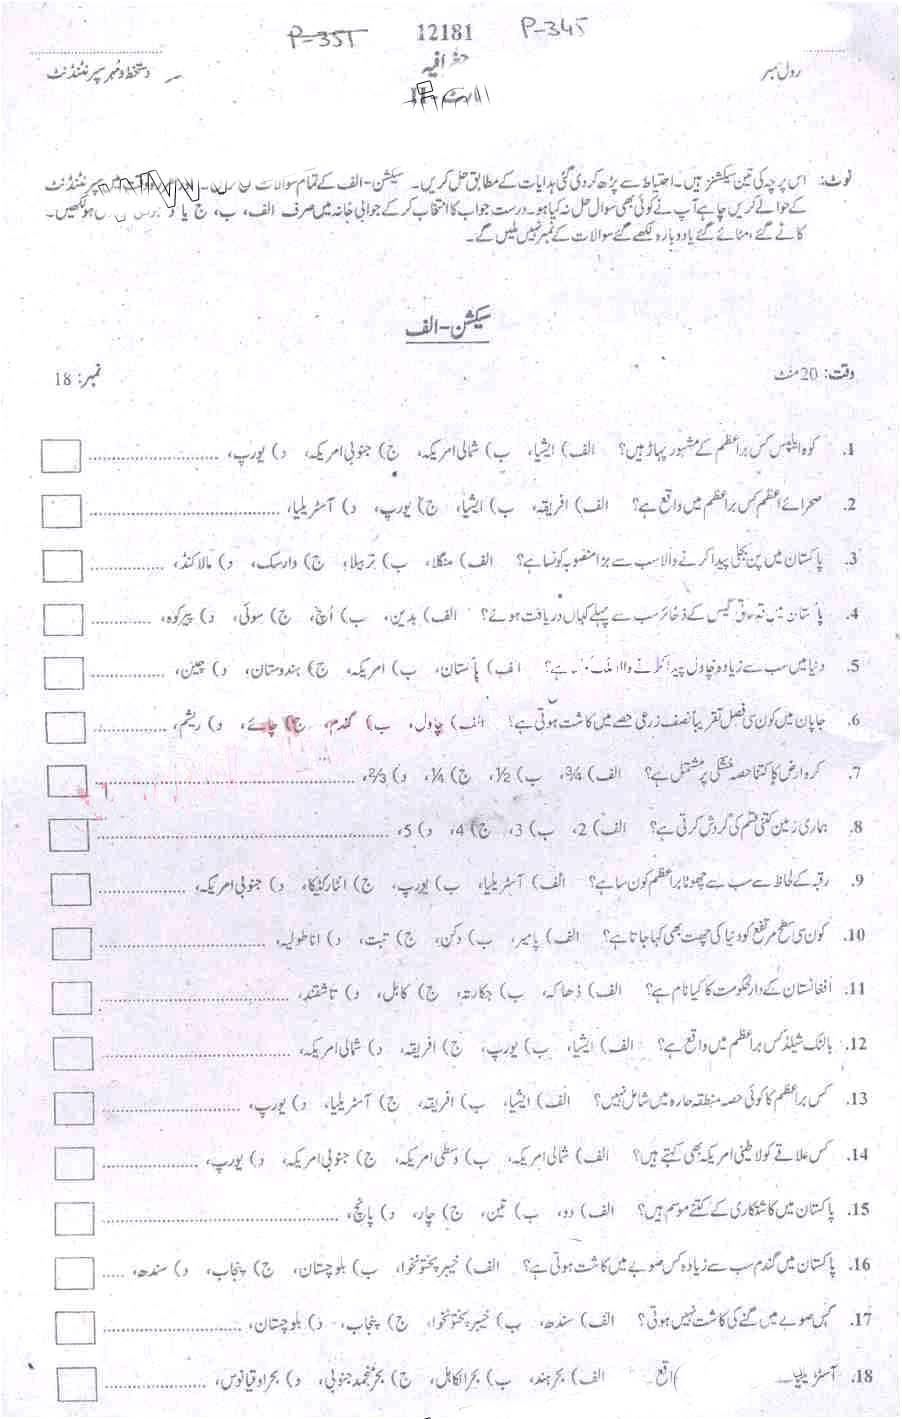 BISE Abbottabad Board Past Papers 2019 Inter Part 1 2, FA, HSSC, FSC